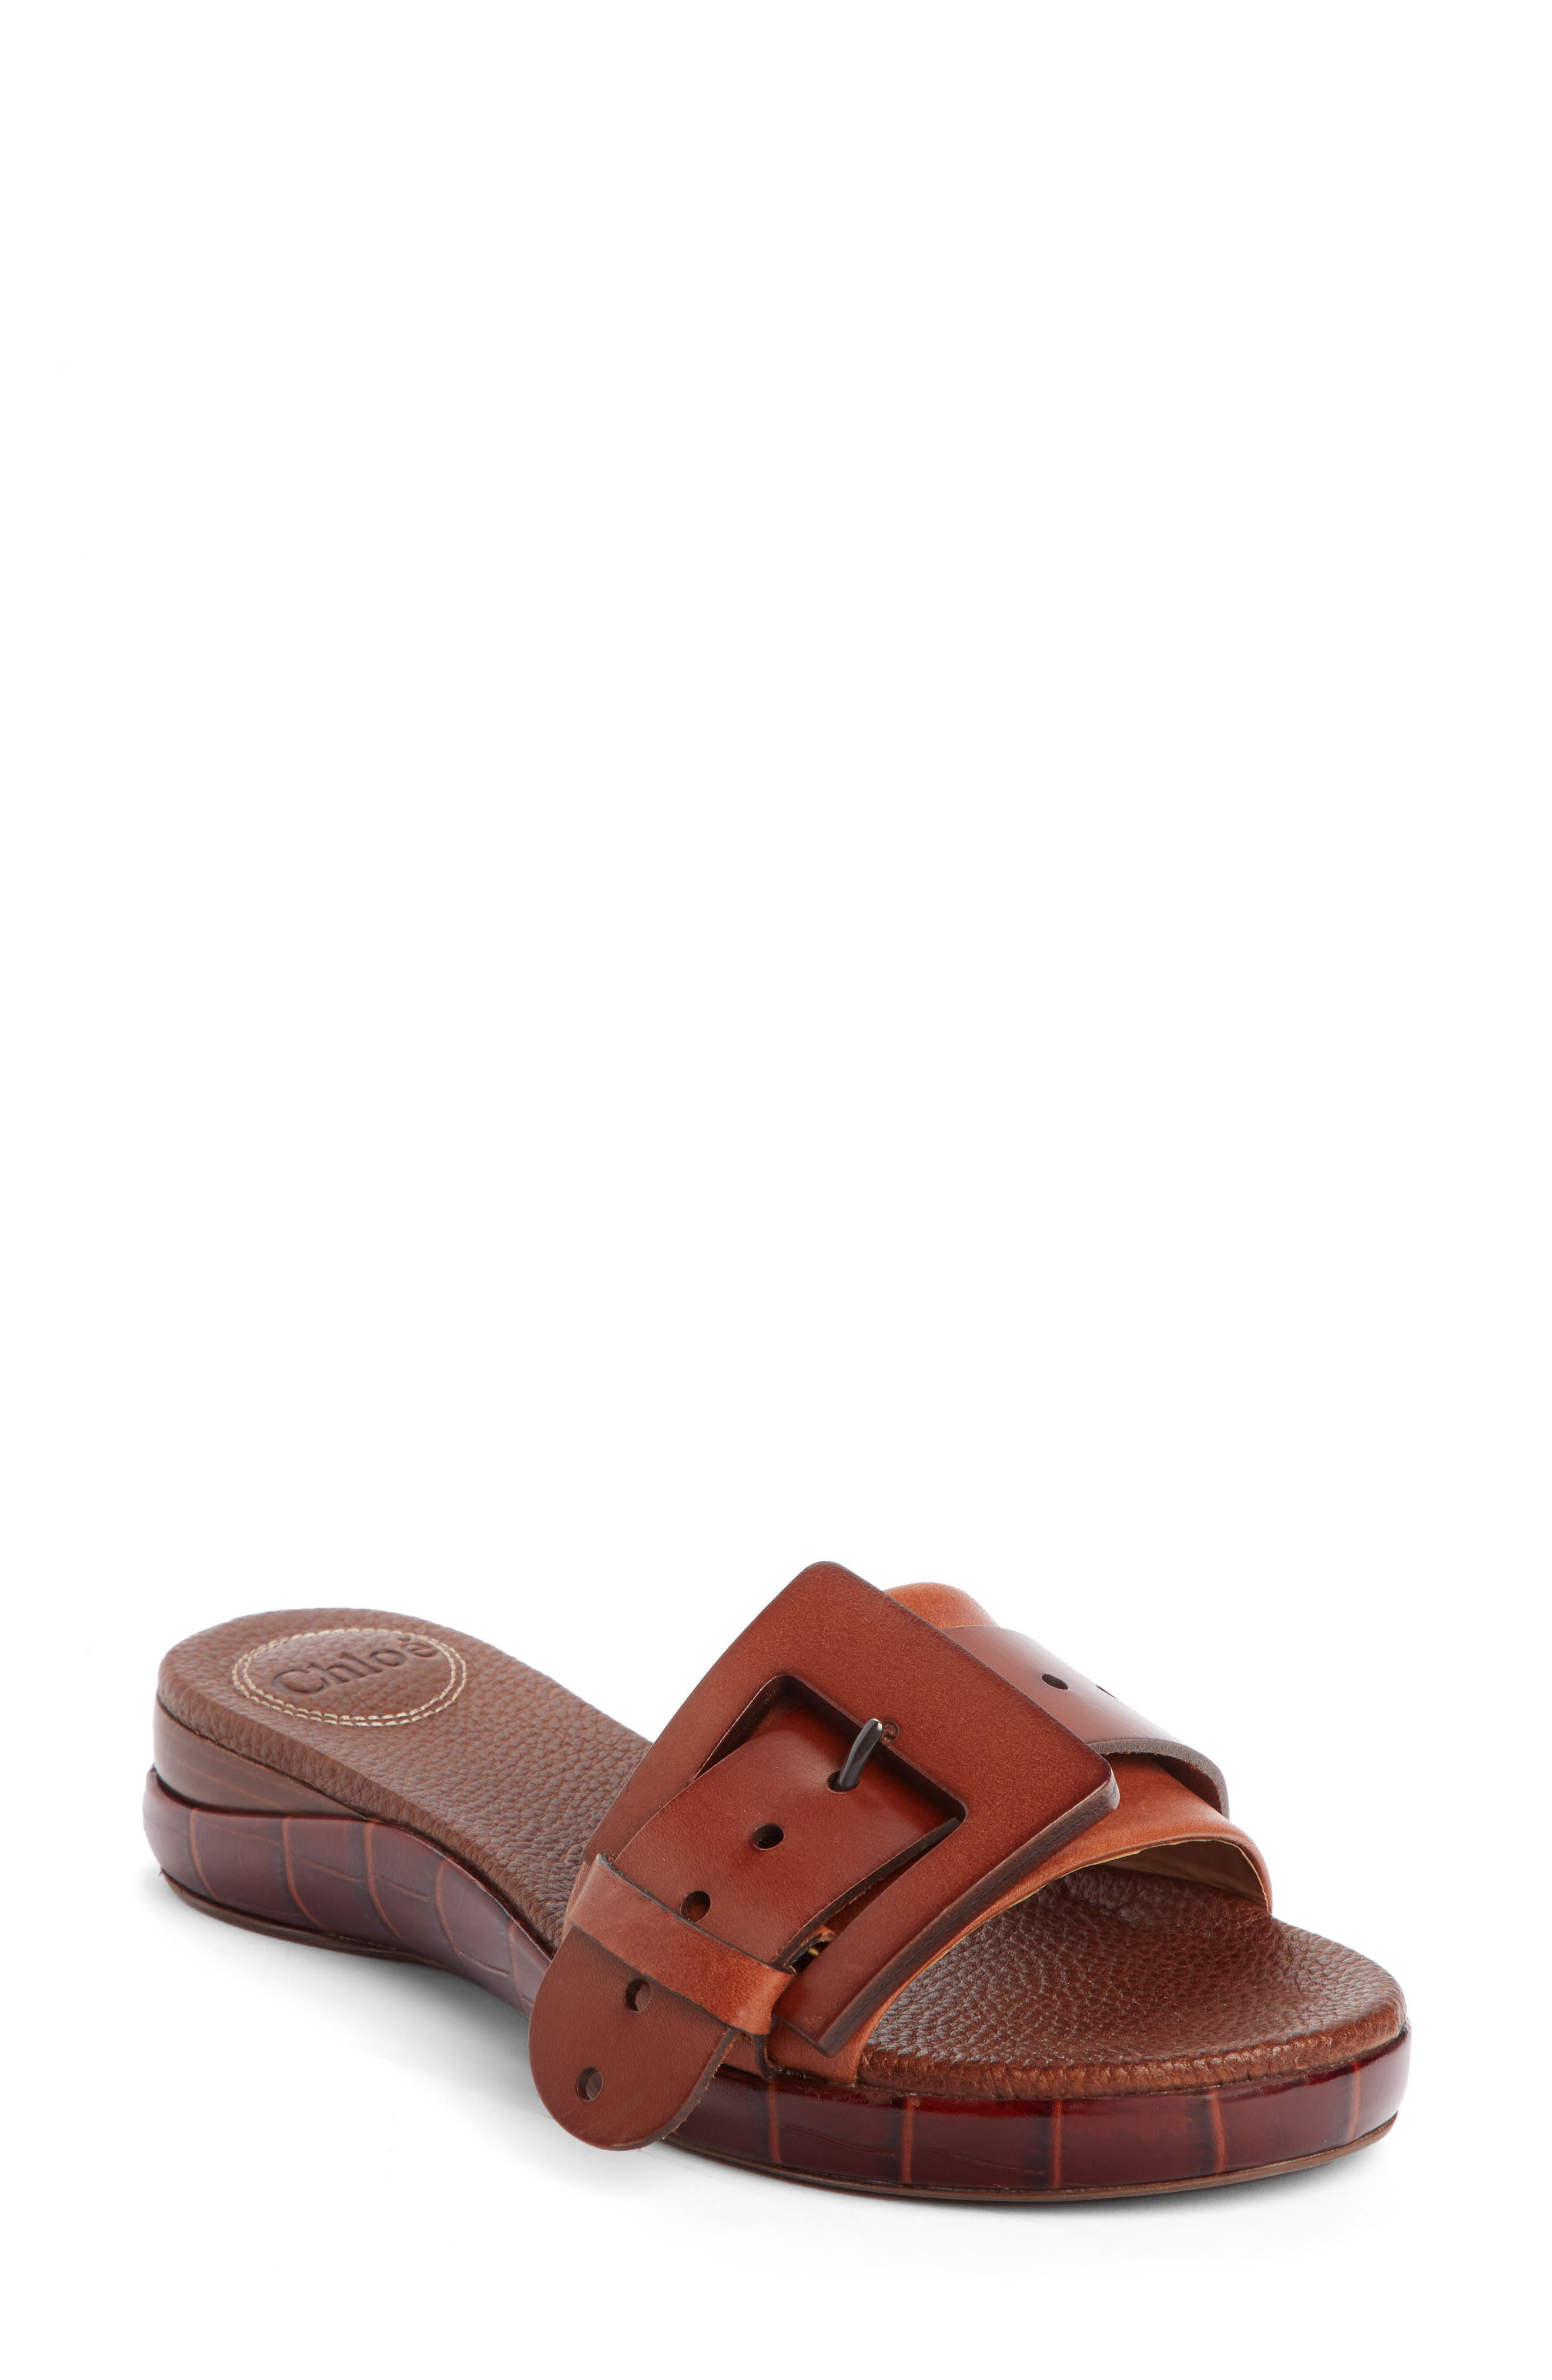 Willy Buckle Slide Sandal, Main, color, 200